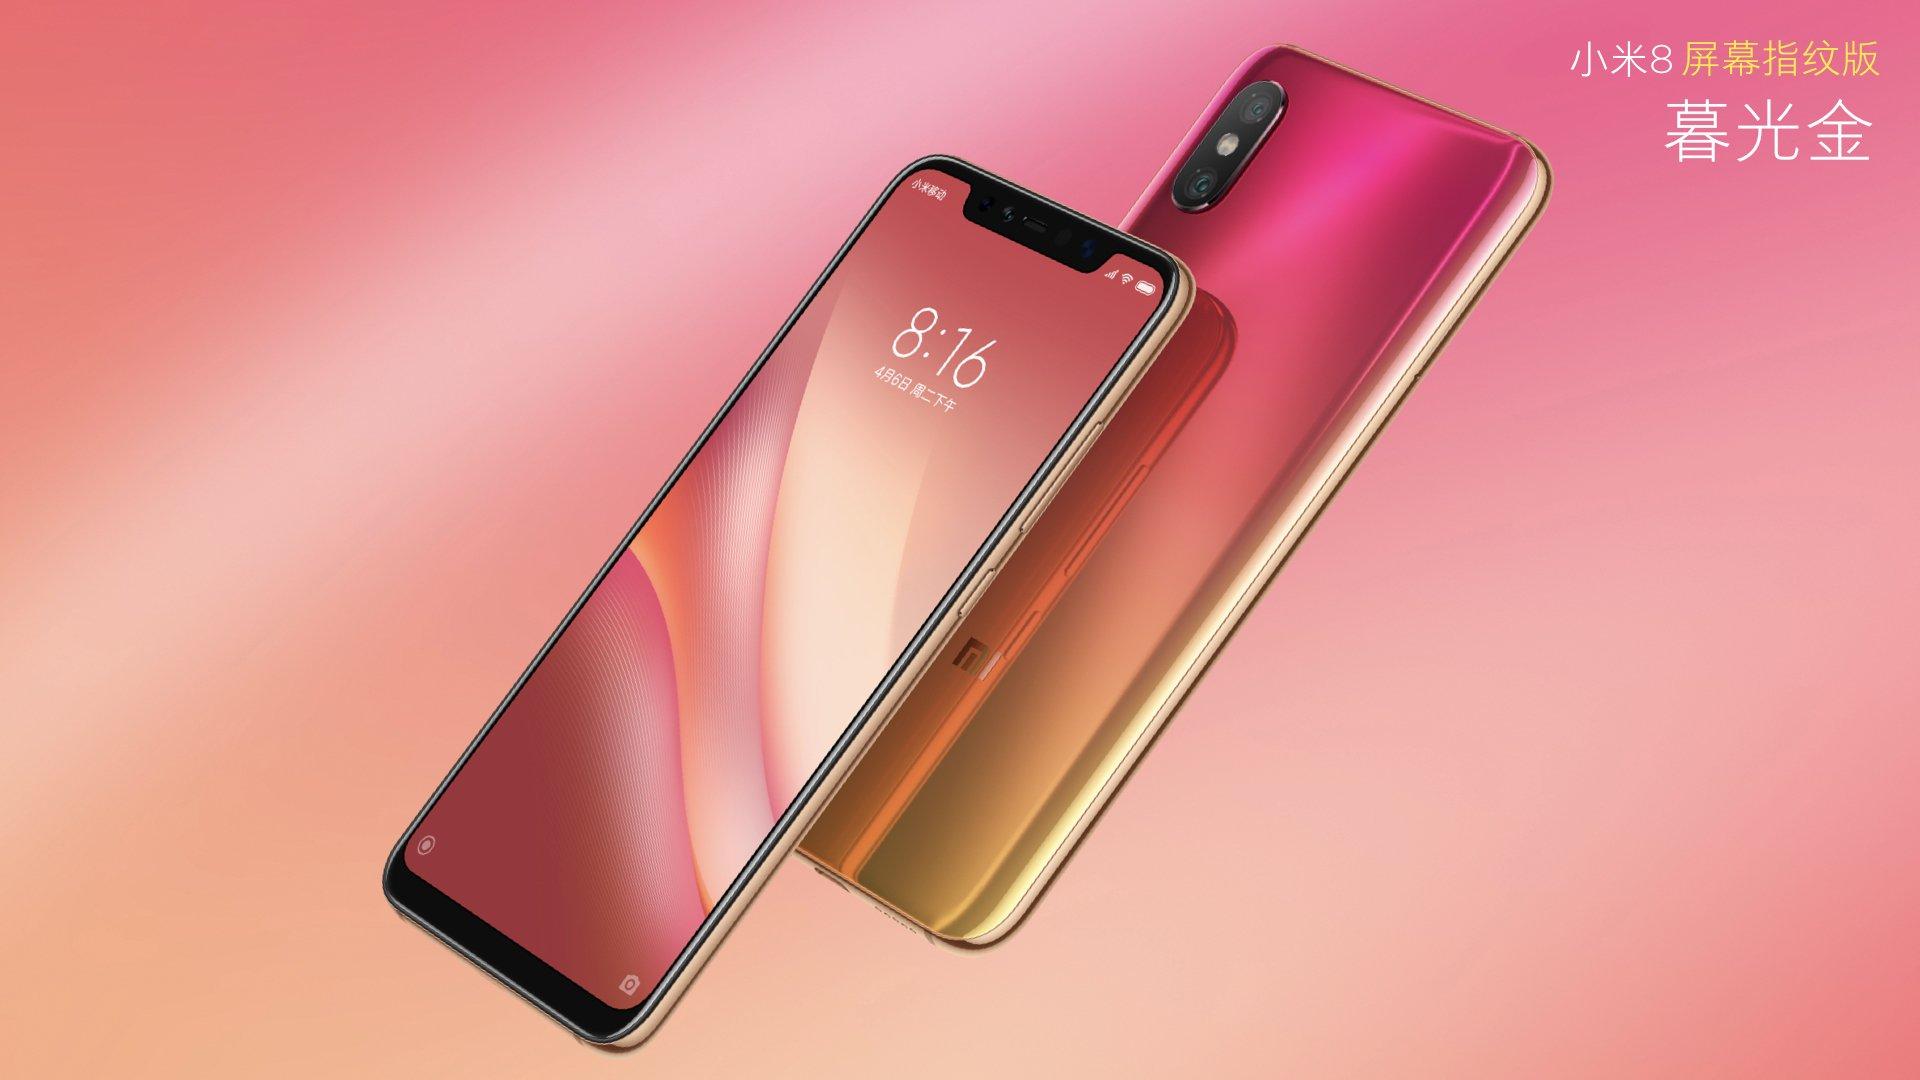 Xiaomi Mi 8 Pro Tela Impressão Digital Edição Twilight Gold b